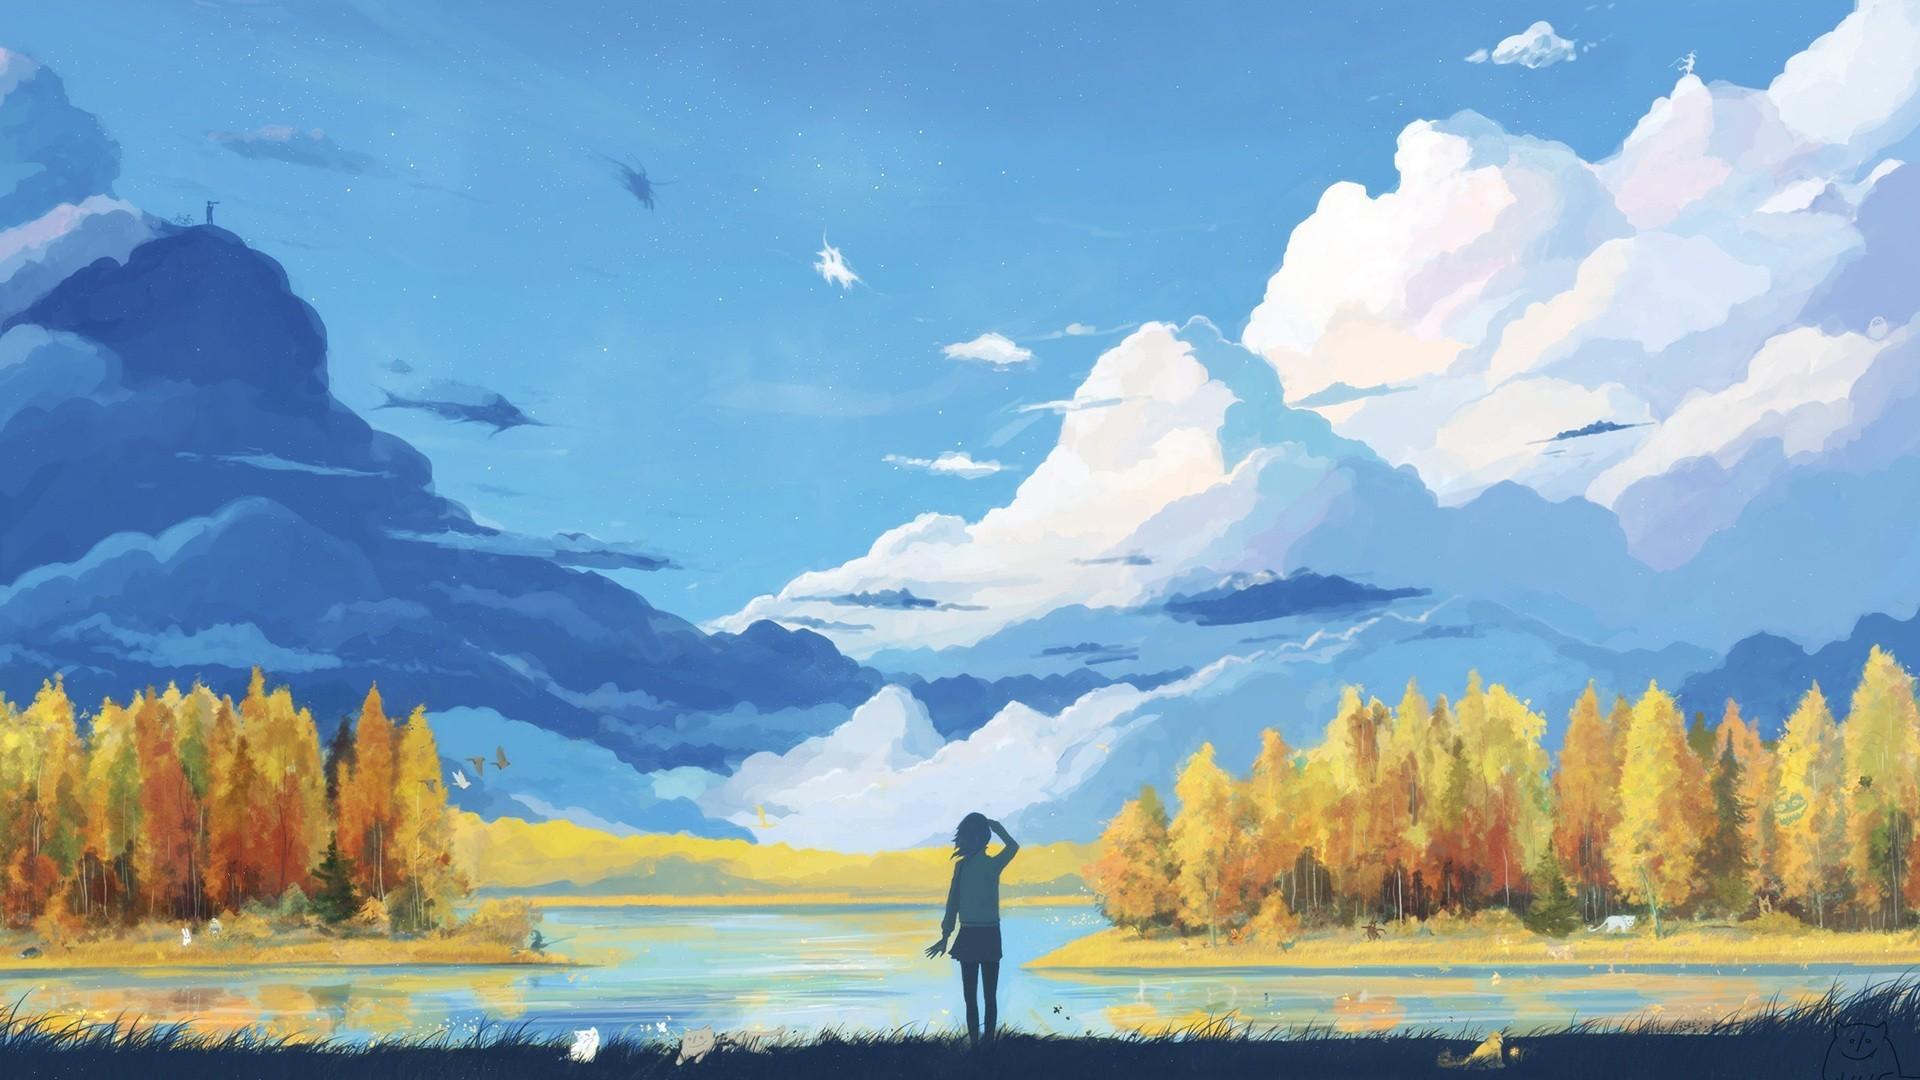 anime, Landscape, Nature, Fantasy art, Minimalism, Vector Wallpapers HD /  Desktop and Mobile Backgrounds